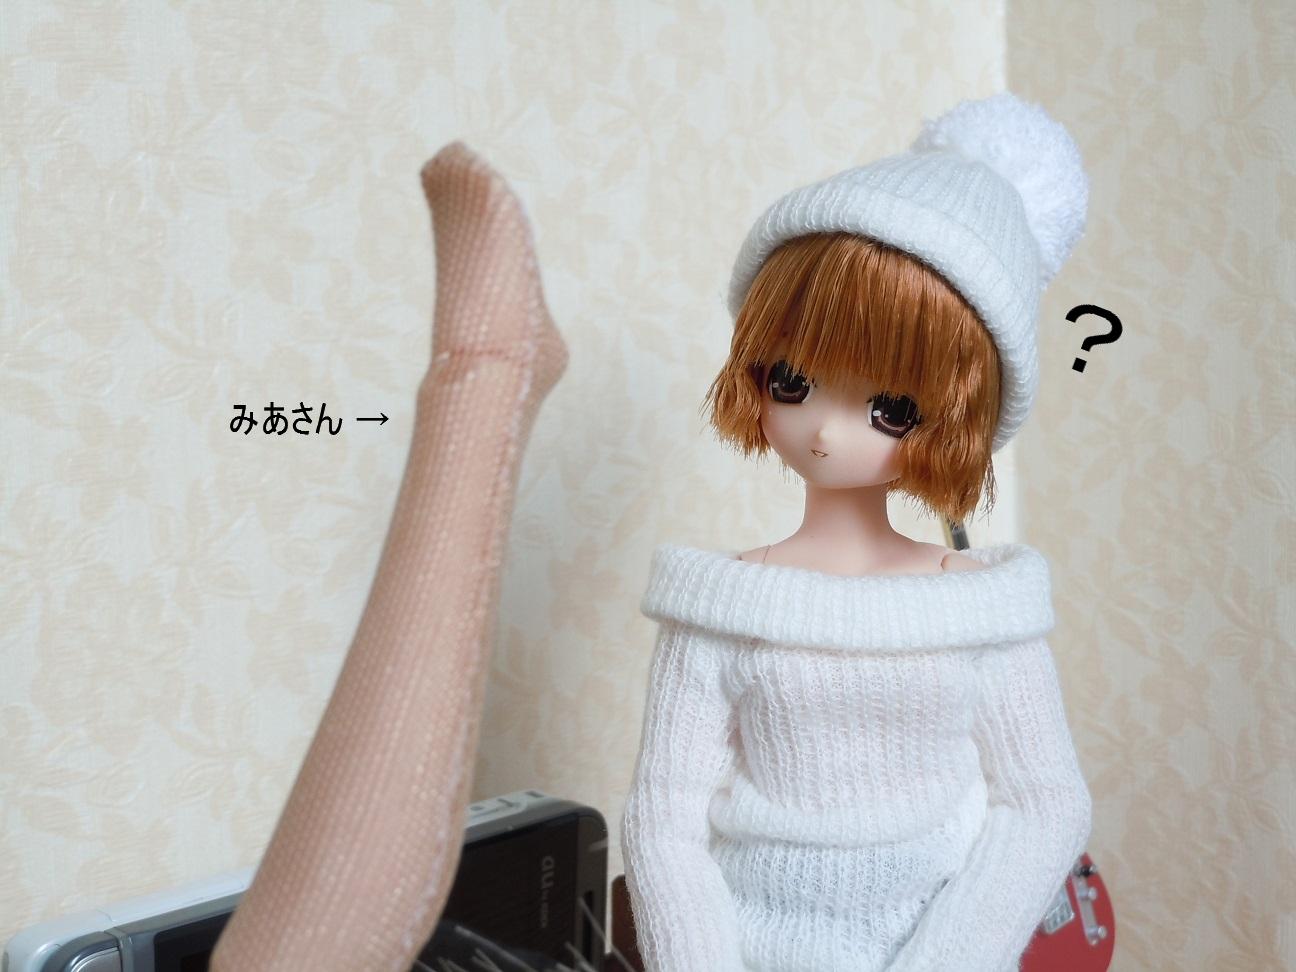 DSCN4610a.jpg